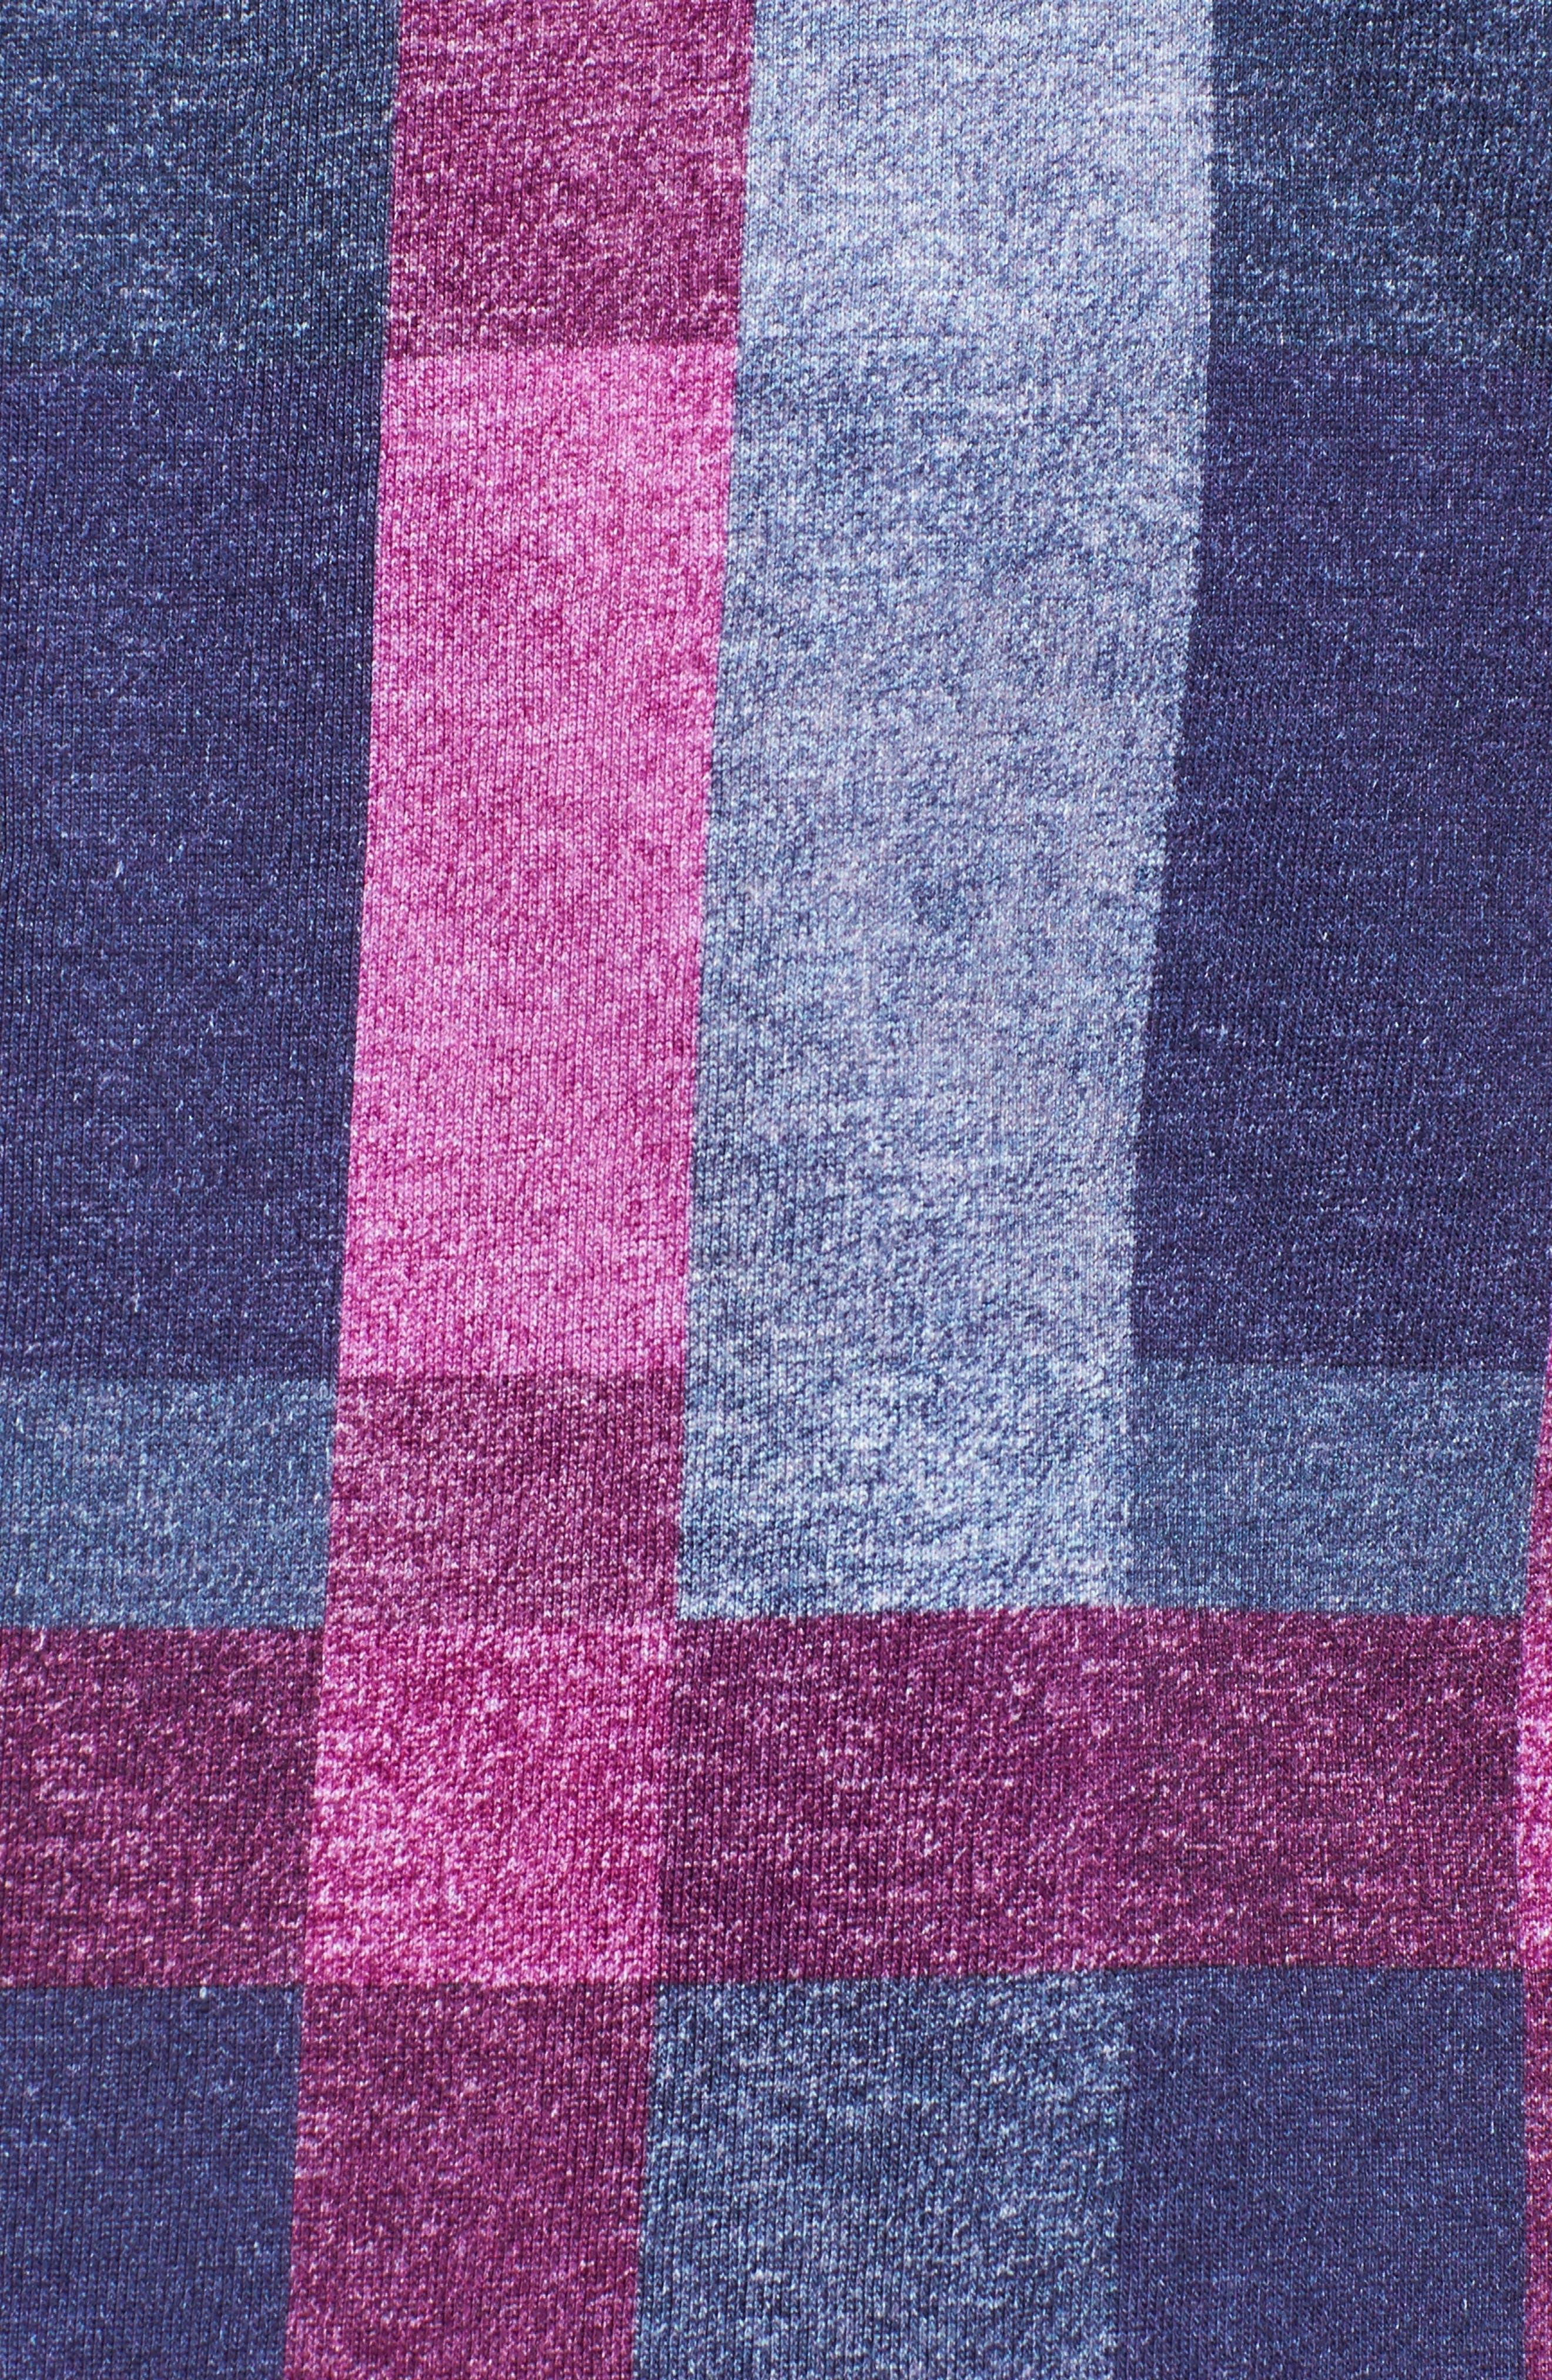 Multicheck Print Knit Sport Shirt,                             Alternate thumbnail 5, color,                             410